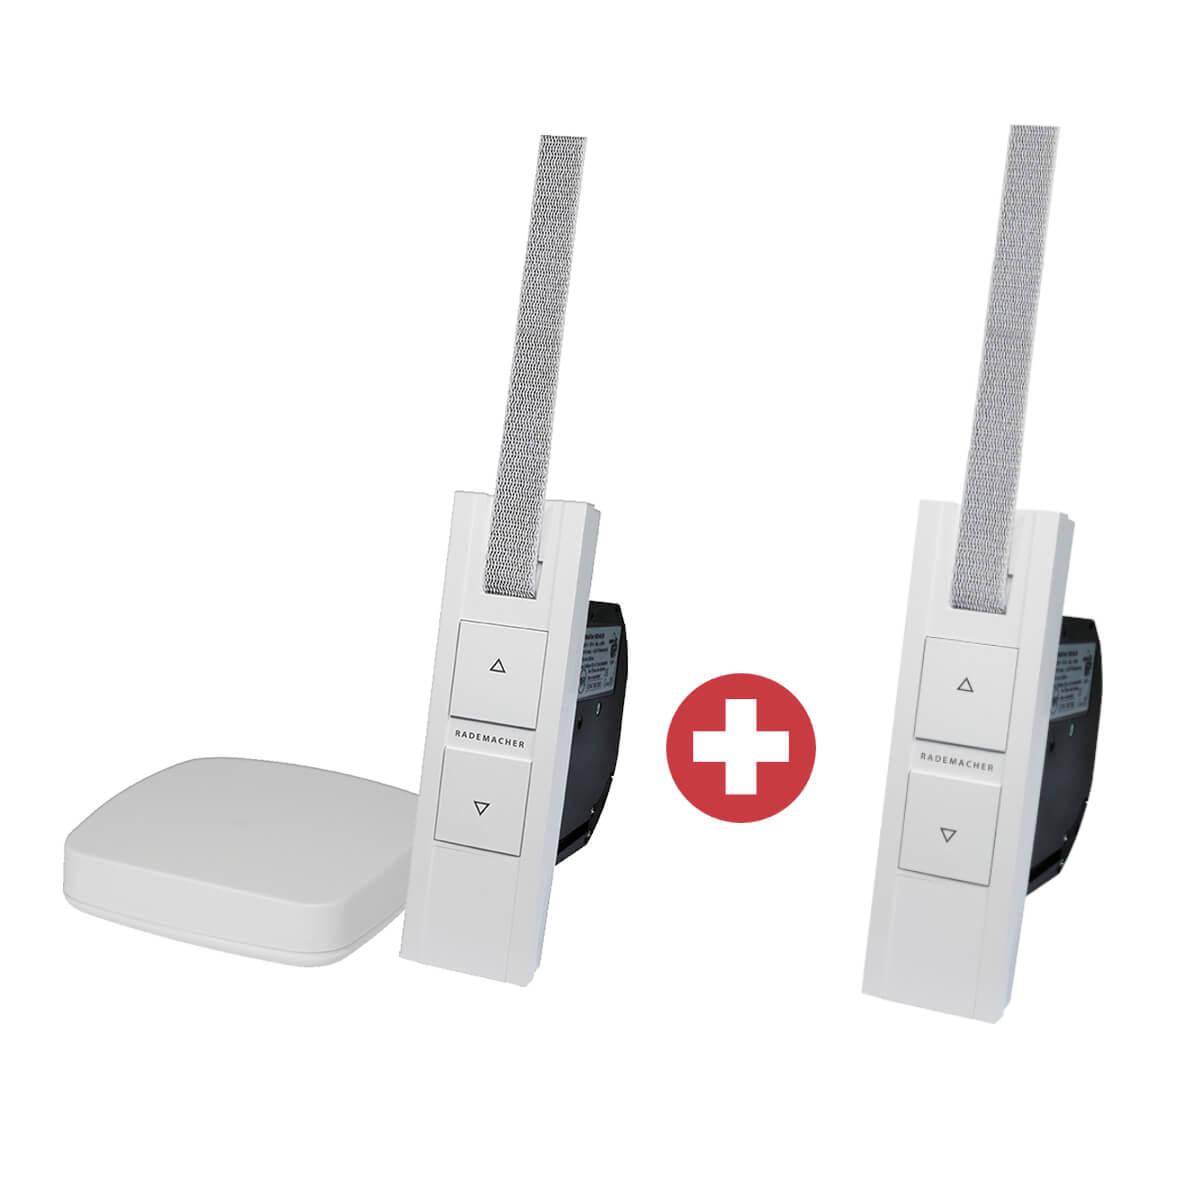 Rademacher Start2Smart Kit Smart Home Zentrale + 2x Funk-Gurtwickler RolloTron Basis DuoFern 1200